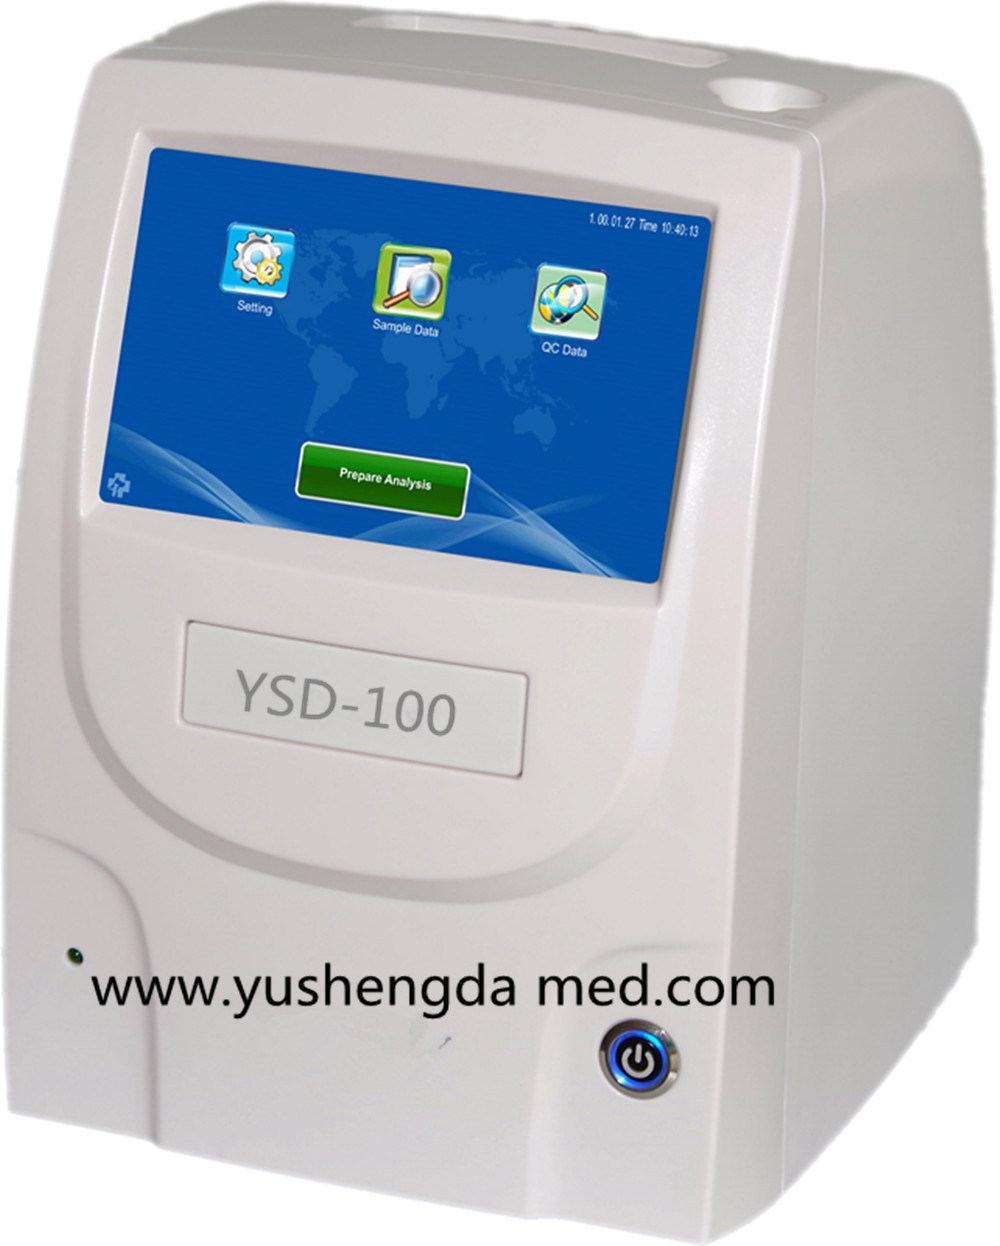 Ysd100 Hot Sale Automatic Medical Equipment Biochemistry Analyzer